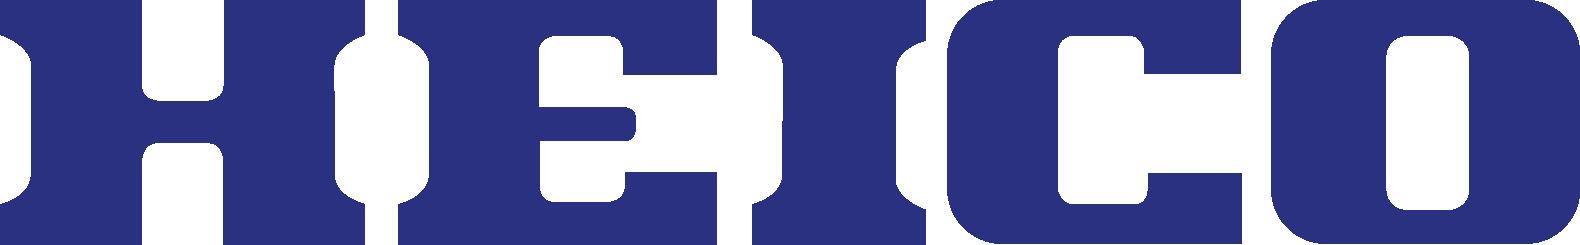 Heico Logo png